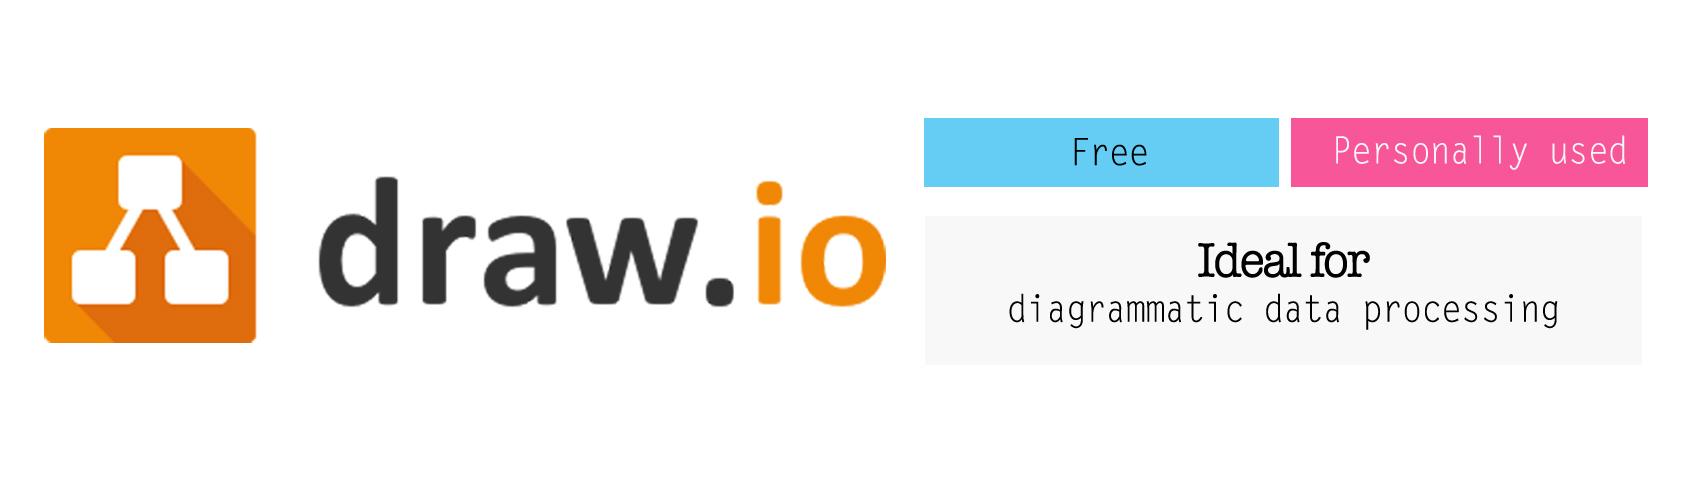 draw.io for diagrammatic data processing